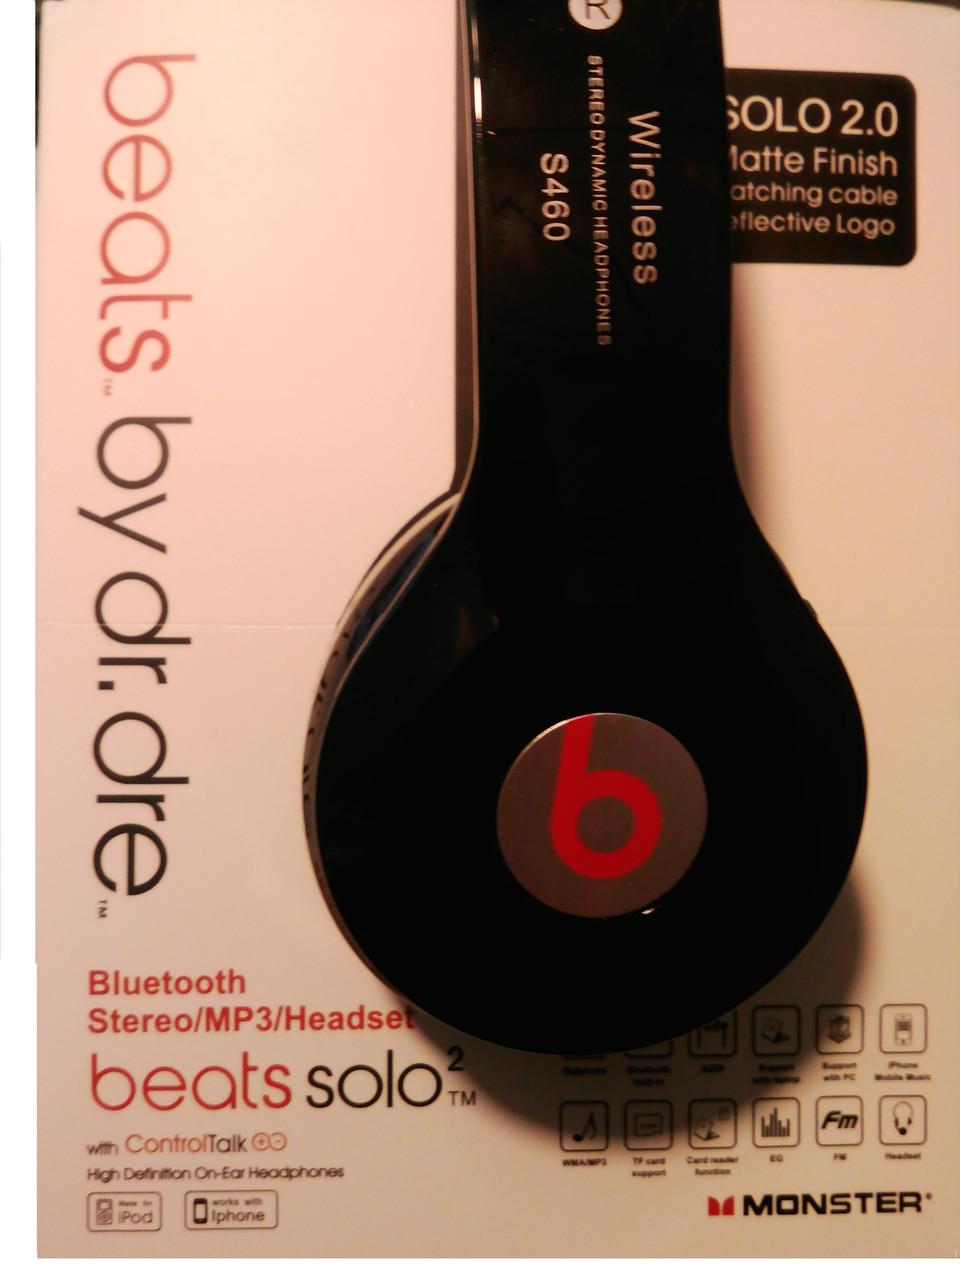 Наушники беспроводные Solo HD Beats S460. Блютус гарнитура S460 (Bluetooth+SD  card+ d07e8c8308f1b